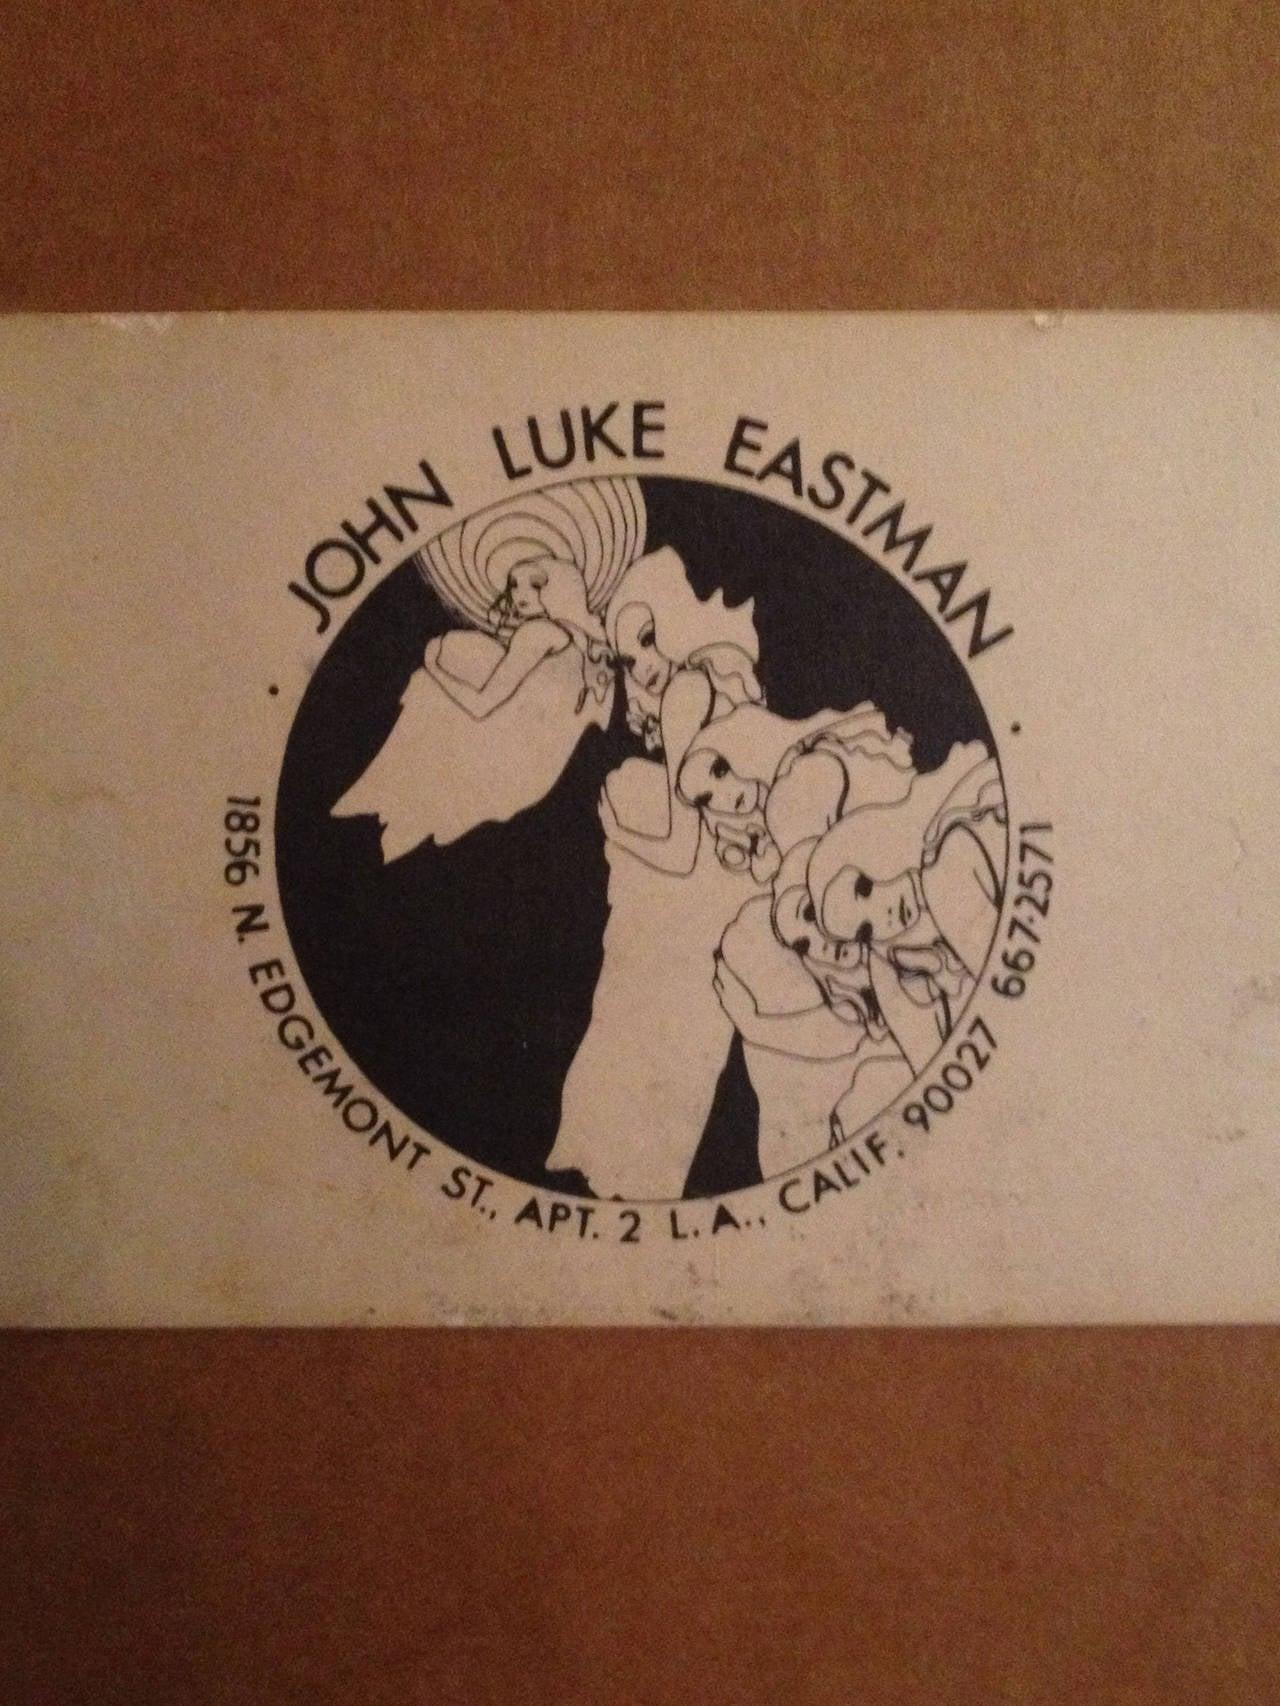 Psychedelic Lithograph by John Luke Eastman 2